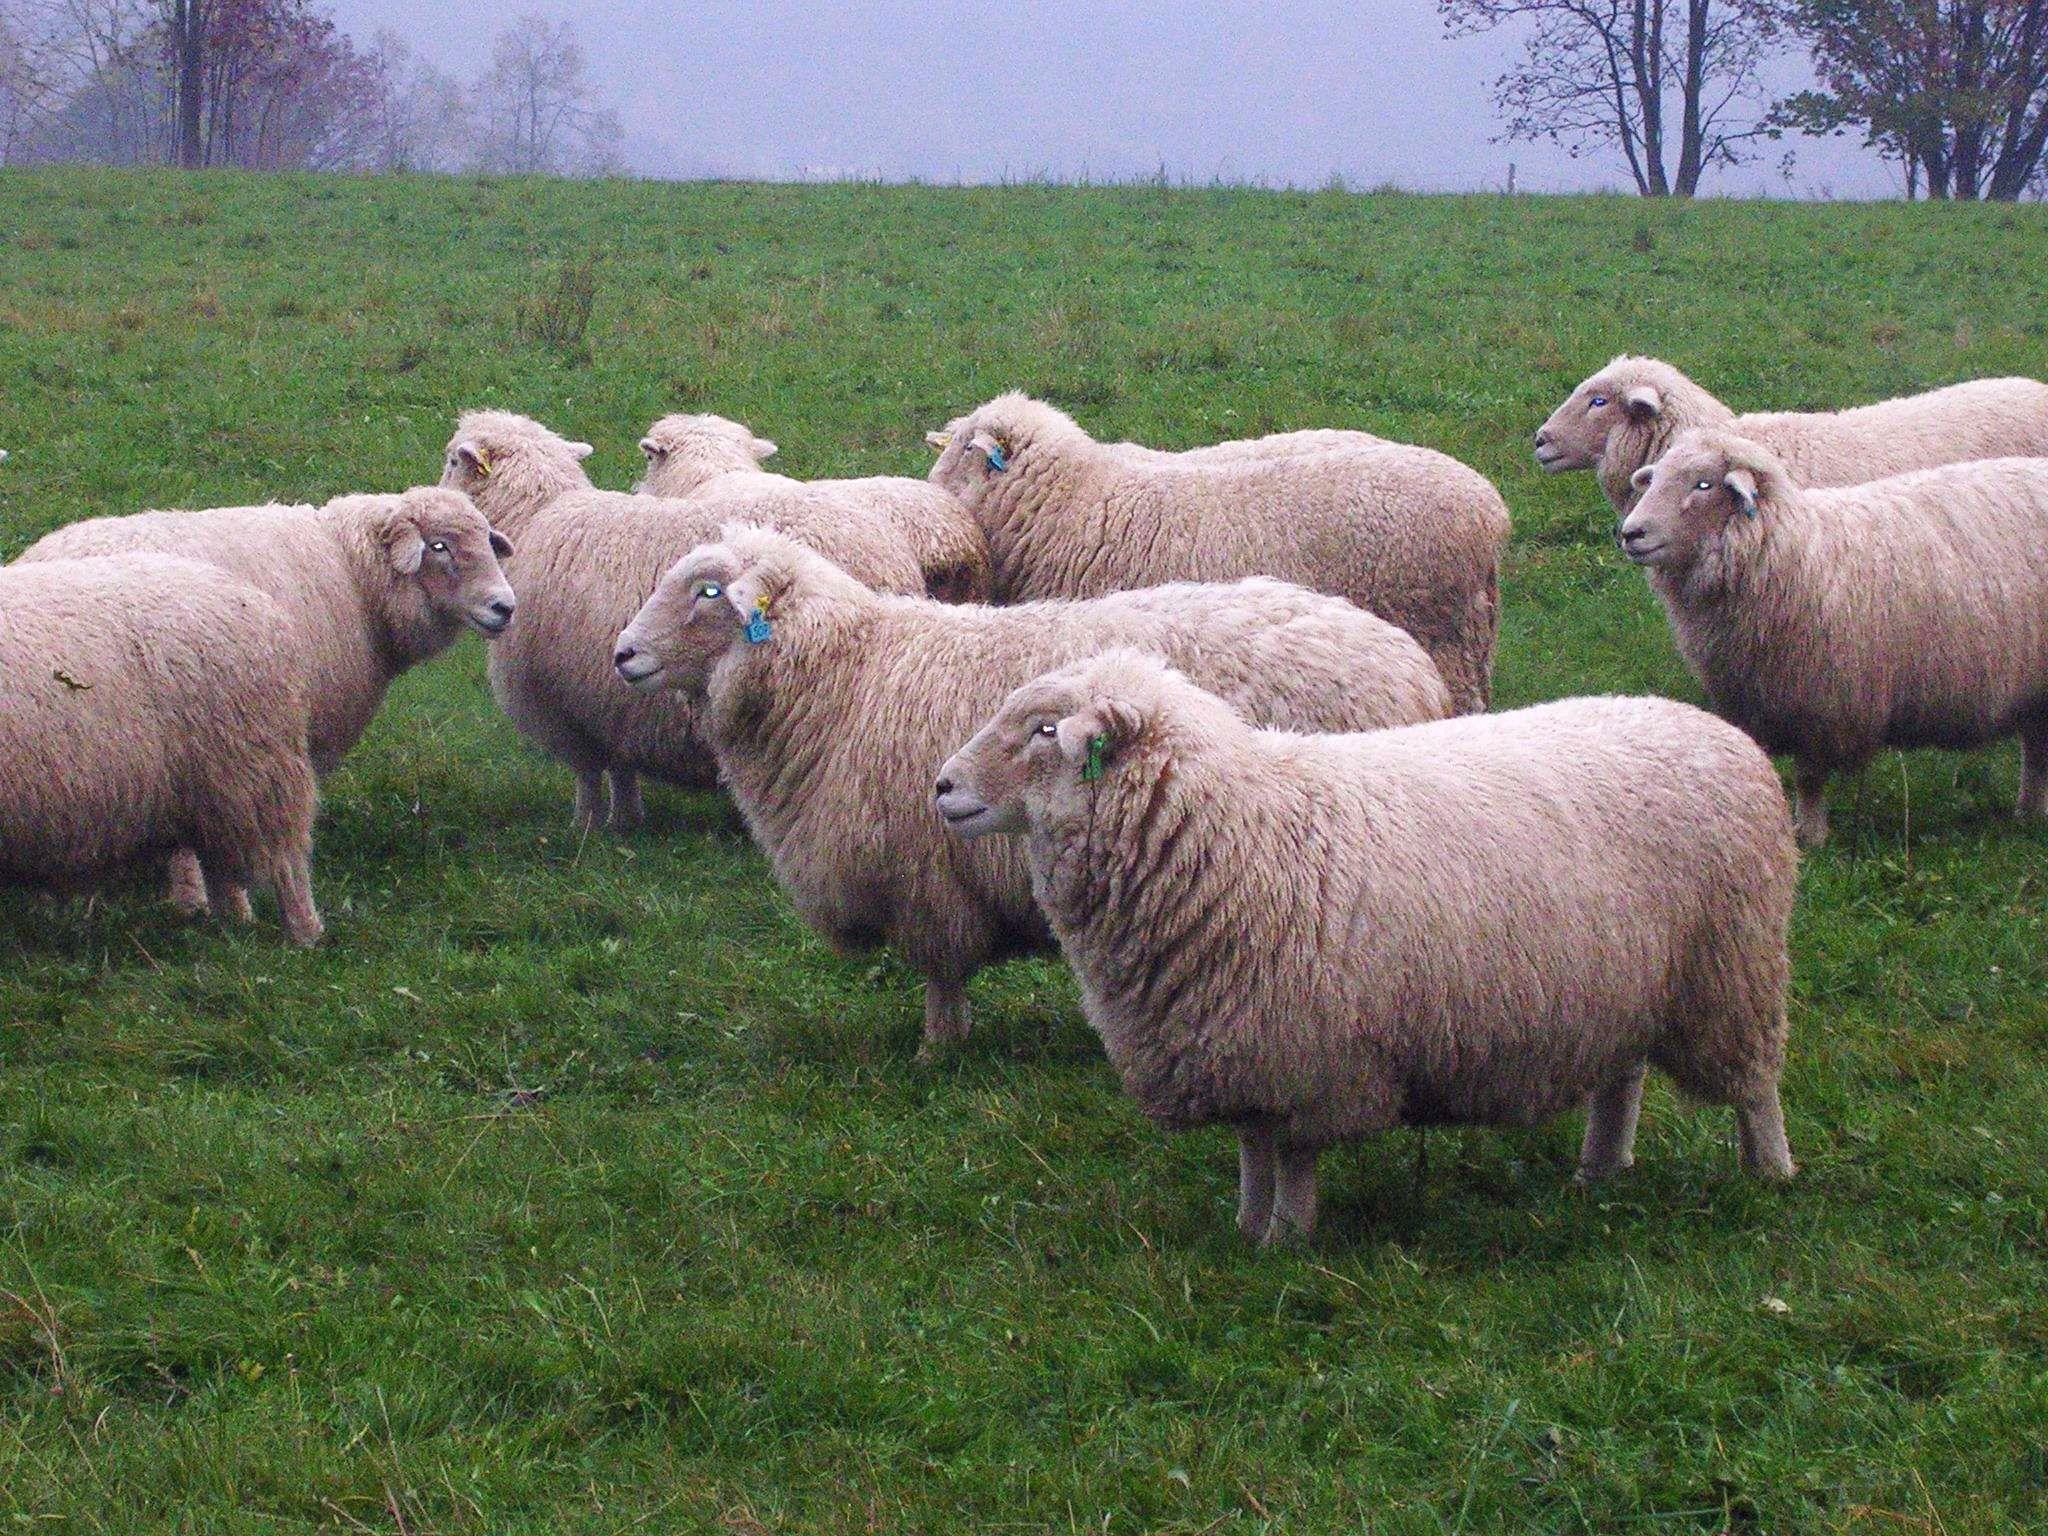 White sheep - photo#12